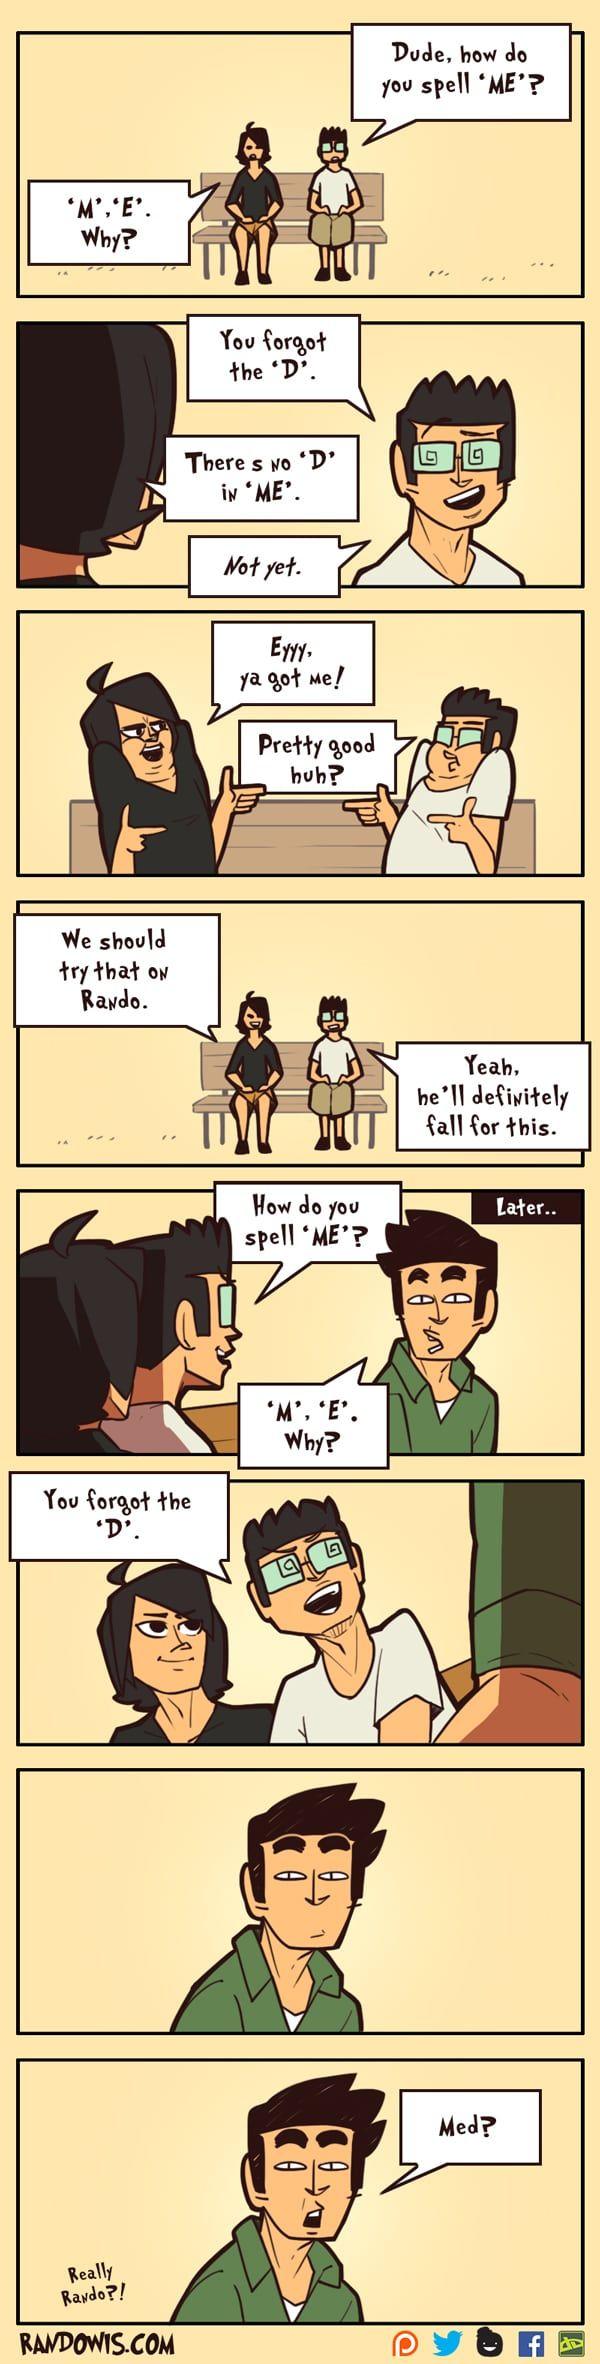 "RandoWis :: ""ME""   Tapastic Comics - image 1"